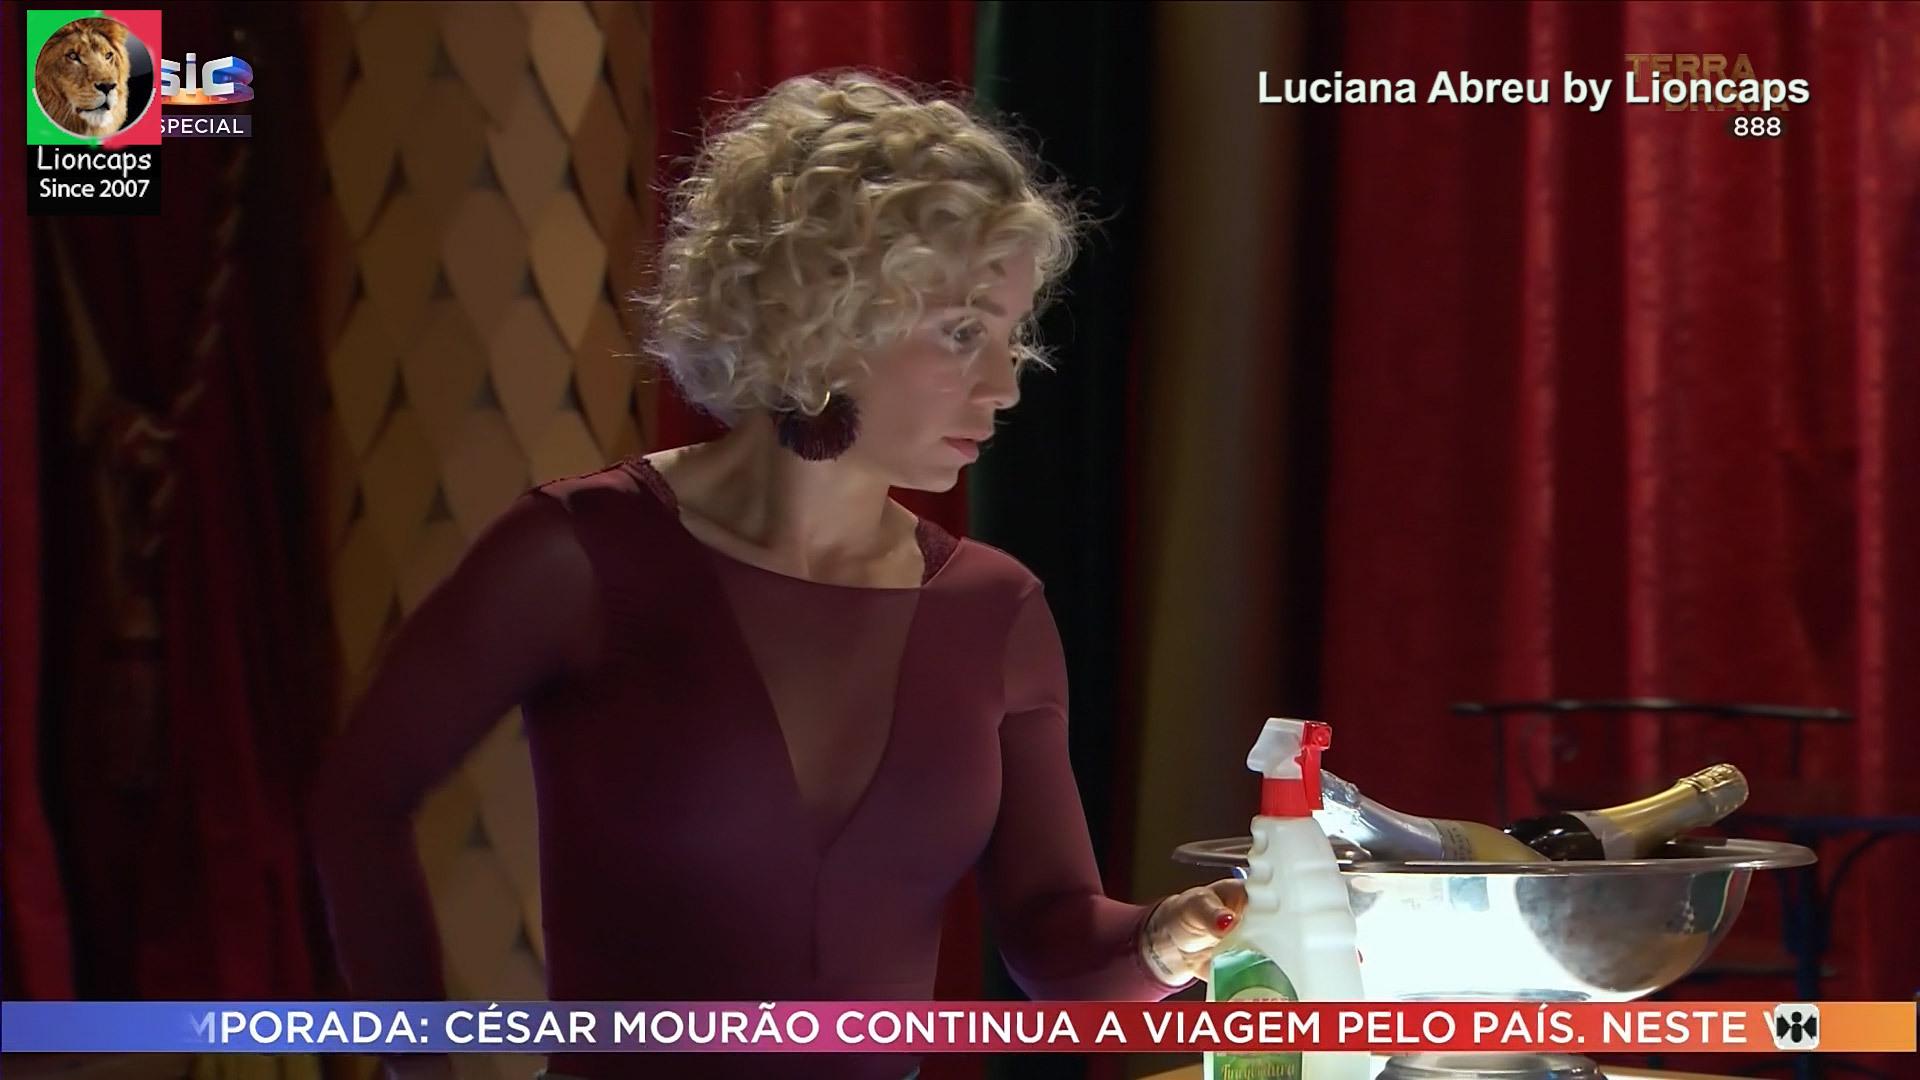 luciana_abreu_terra_brava_lioncaps_30_11_2020_03 (6).jpg